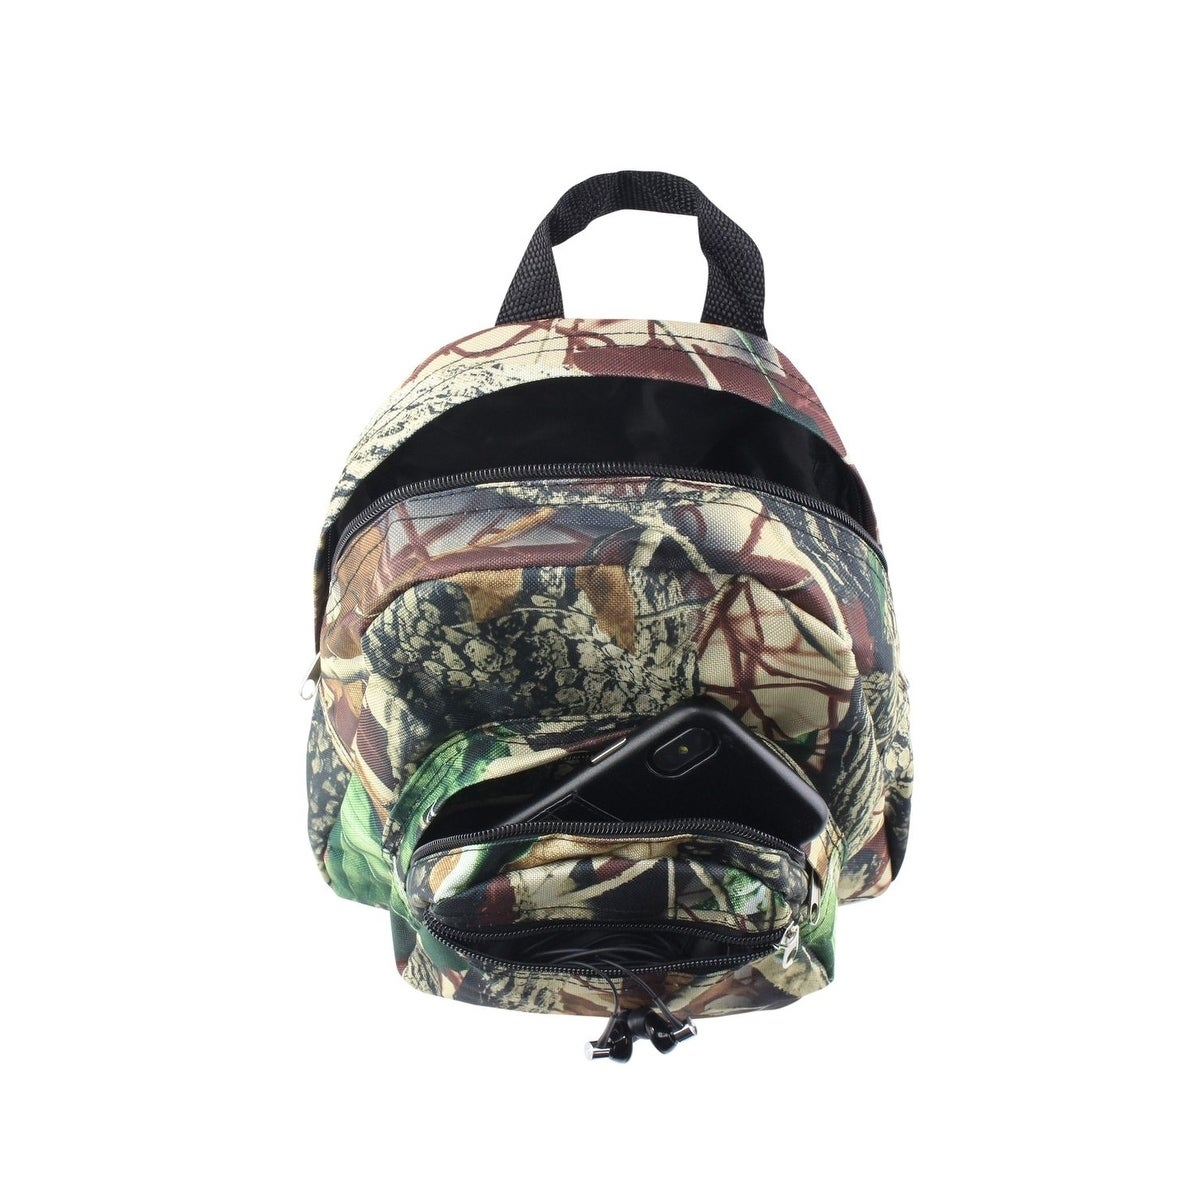 2d7b21efff Shop Zodaca Small Stylish Kids Backpack Outdoor Shoulder Bag Bookbag School  Bag